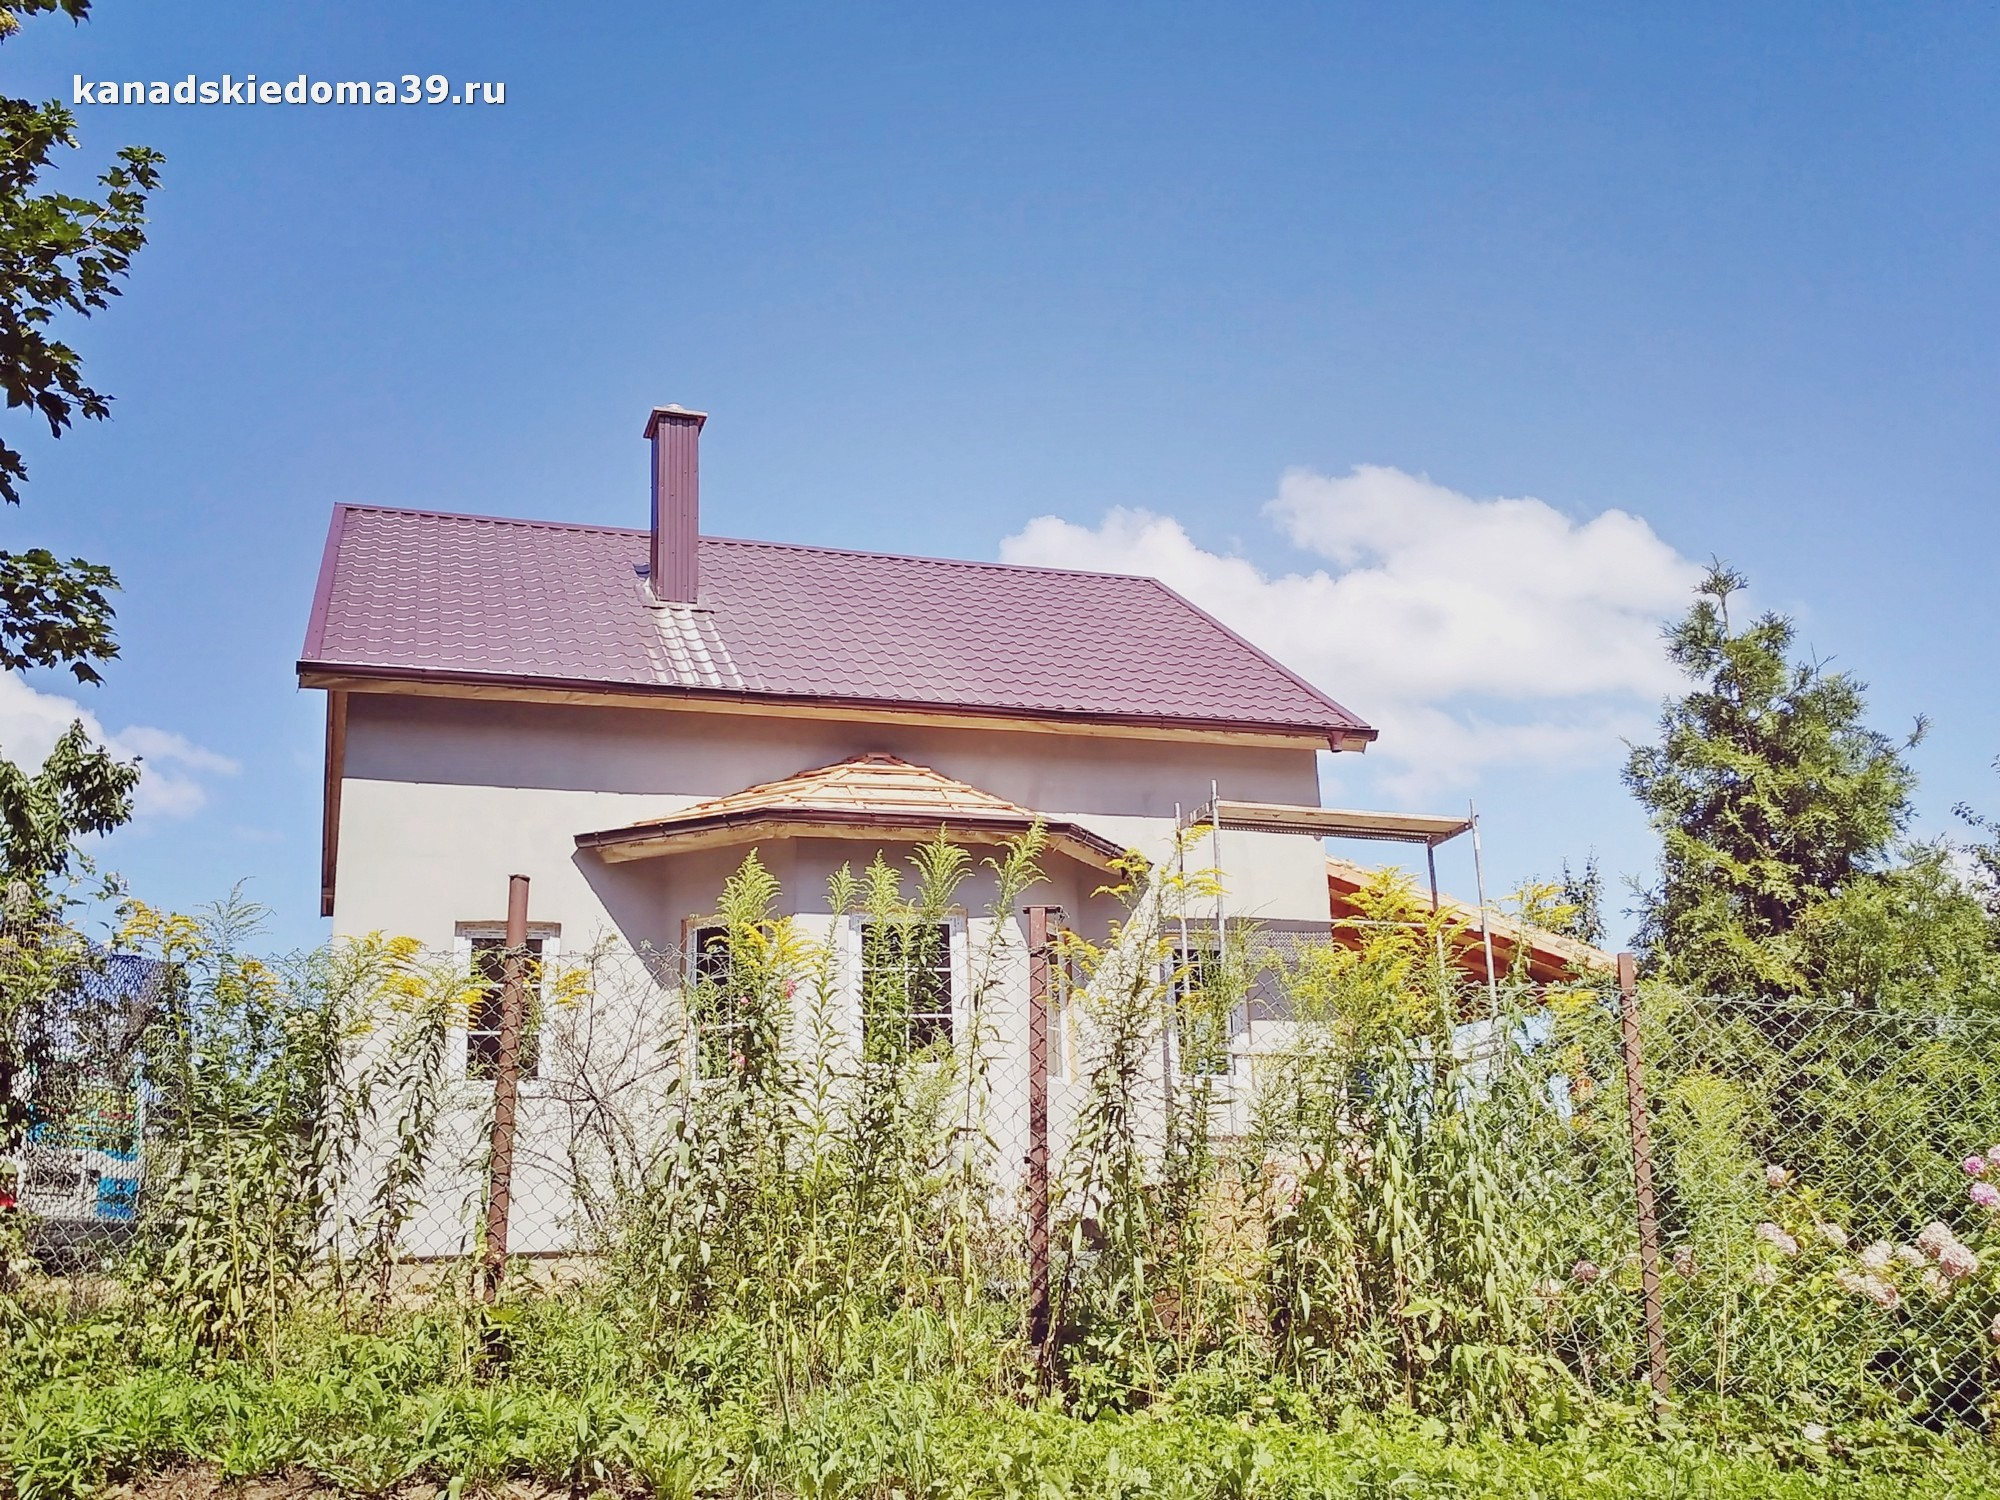 kd-sip-dom-baltiysk00084